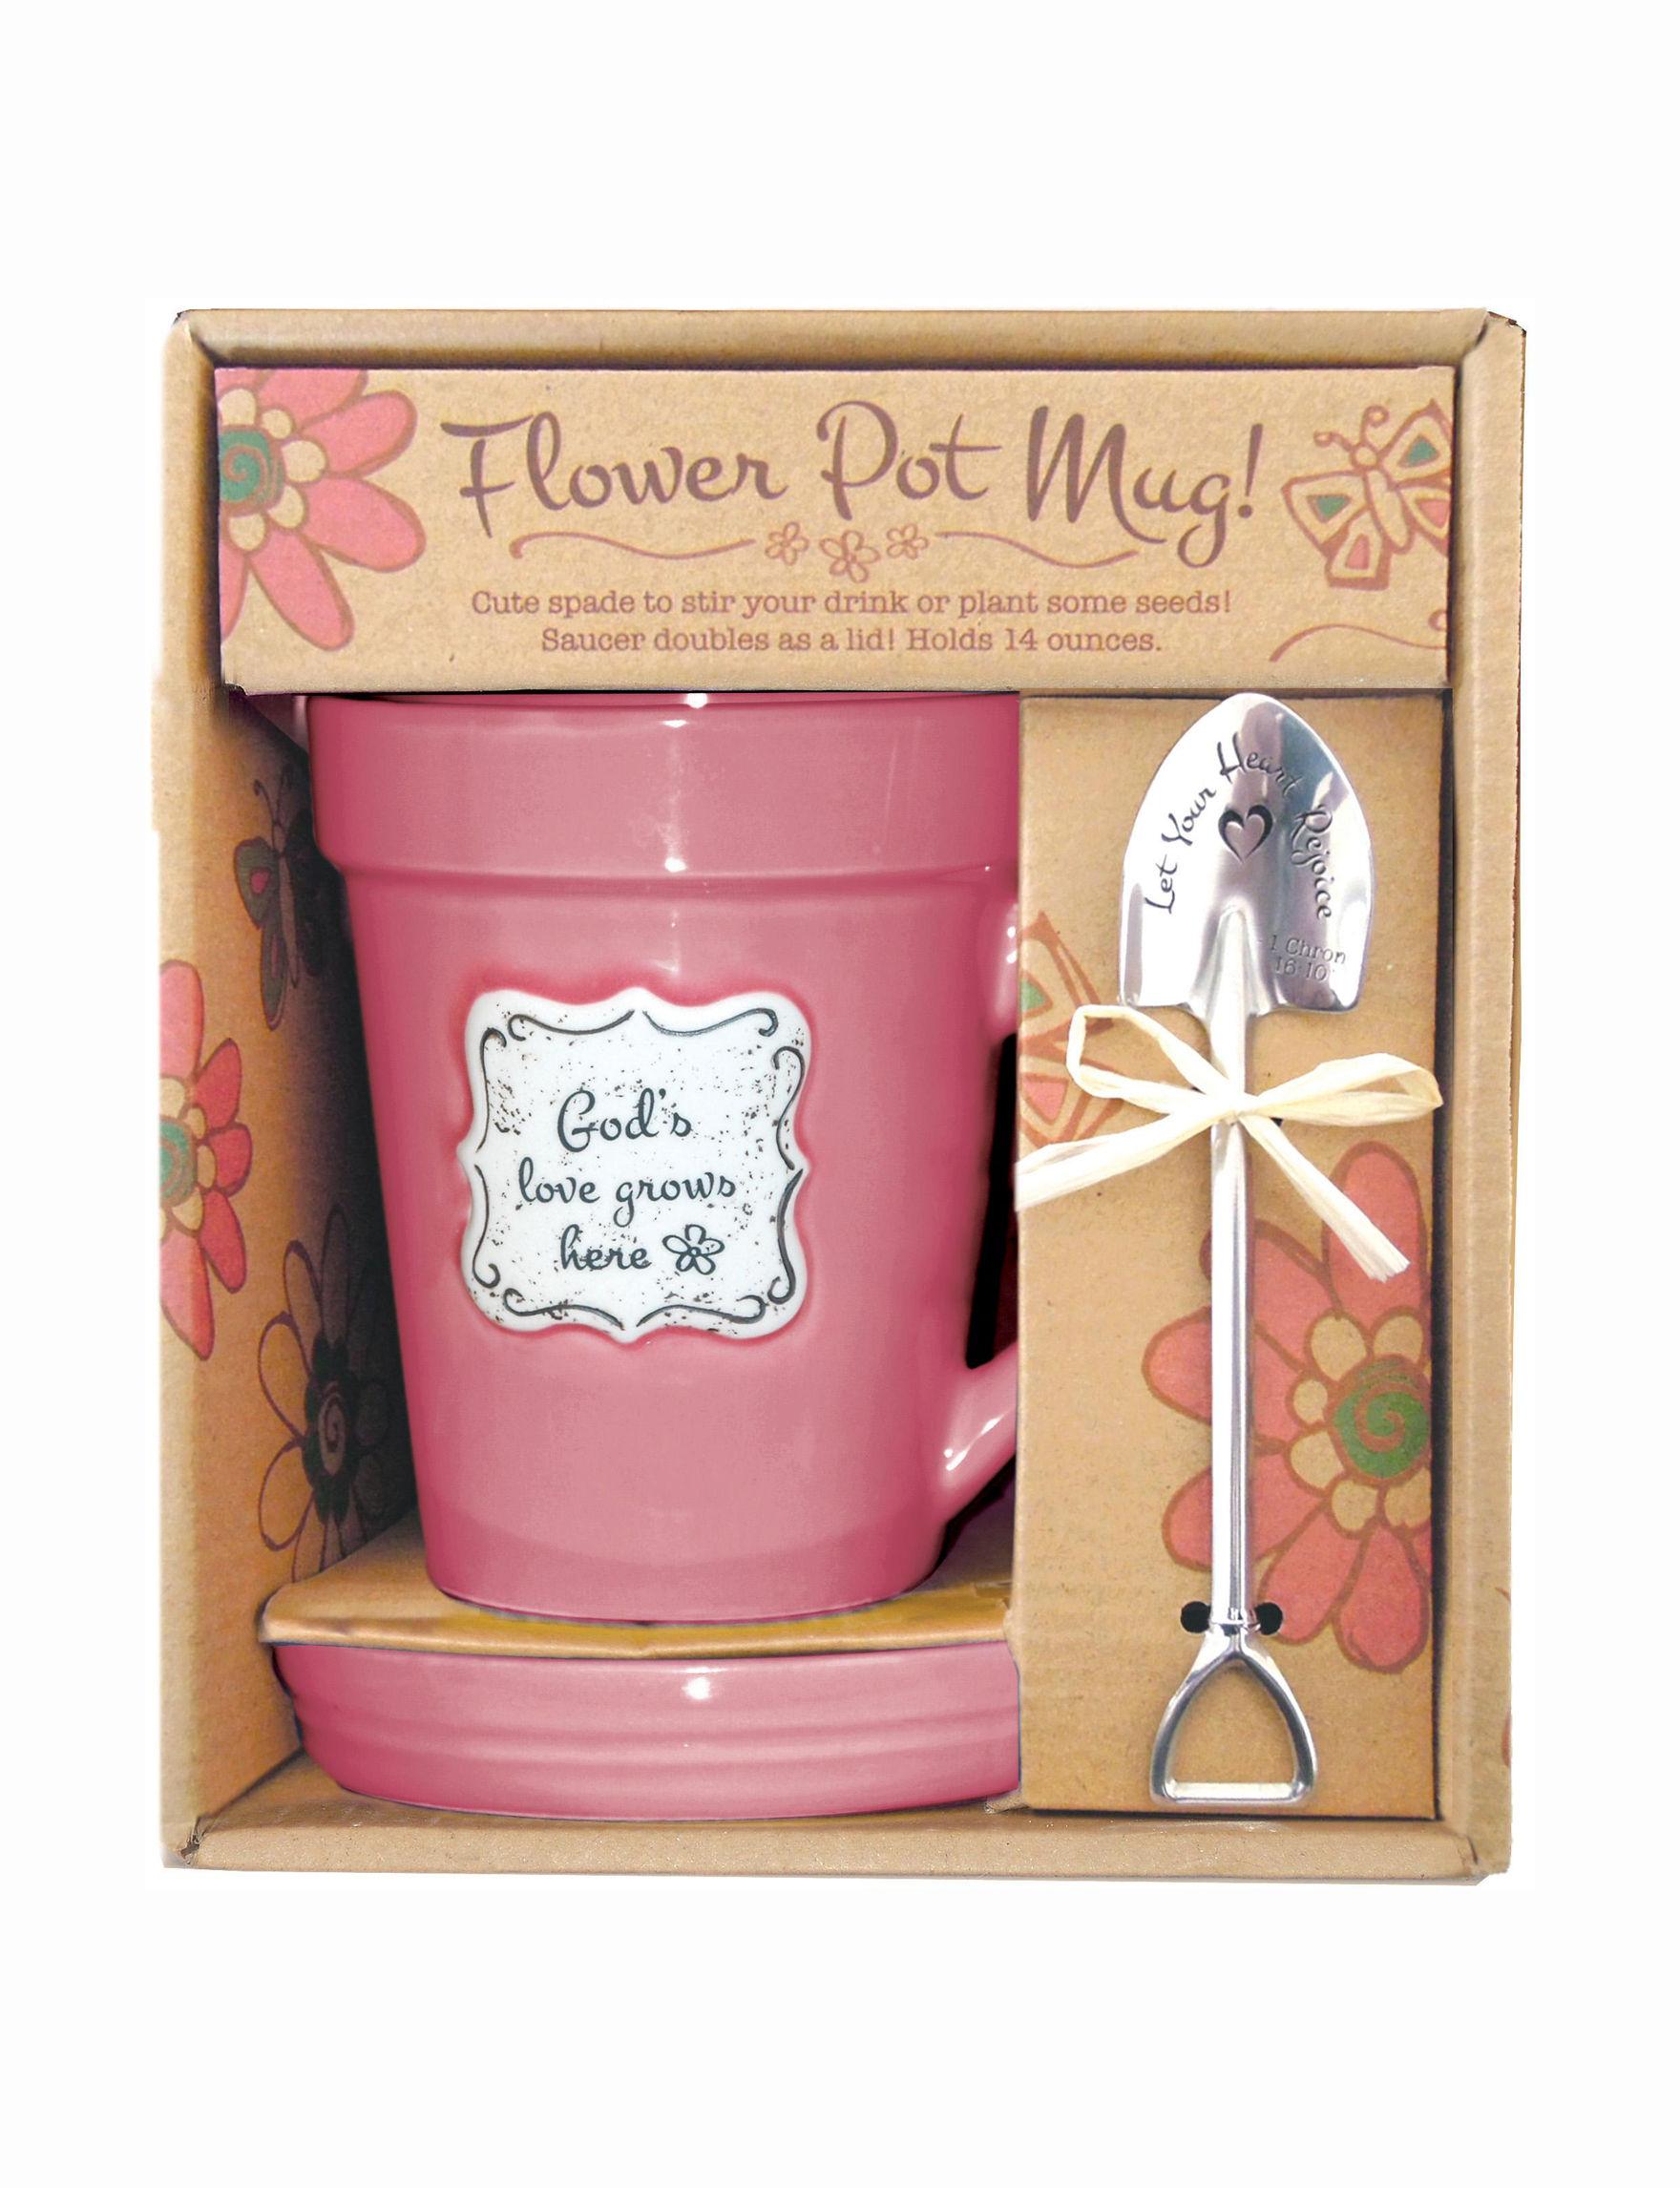 Divinity Dark Pink Garden Decor & Planters Mugs Drinkware Outdoor Decor